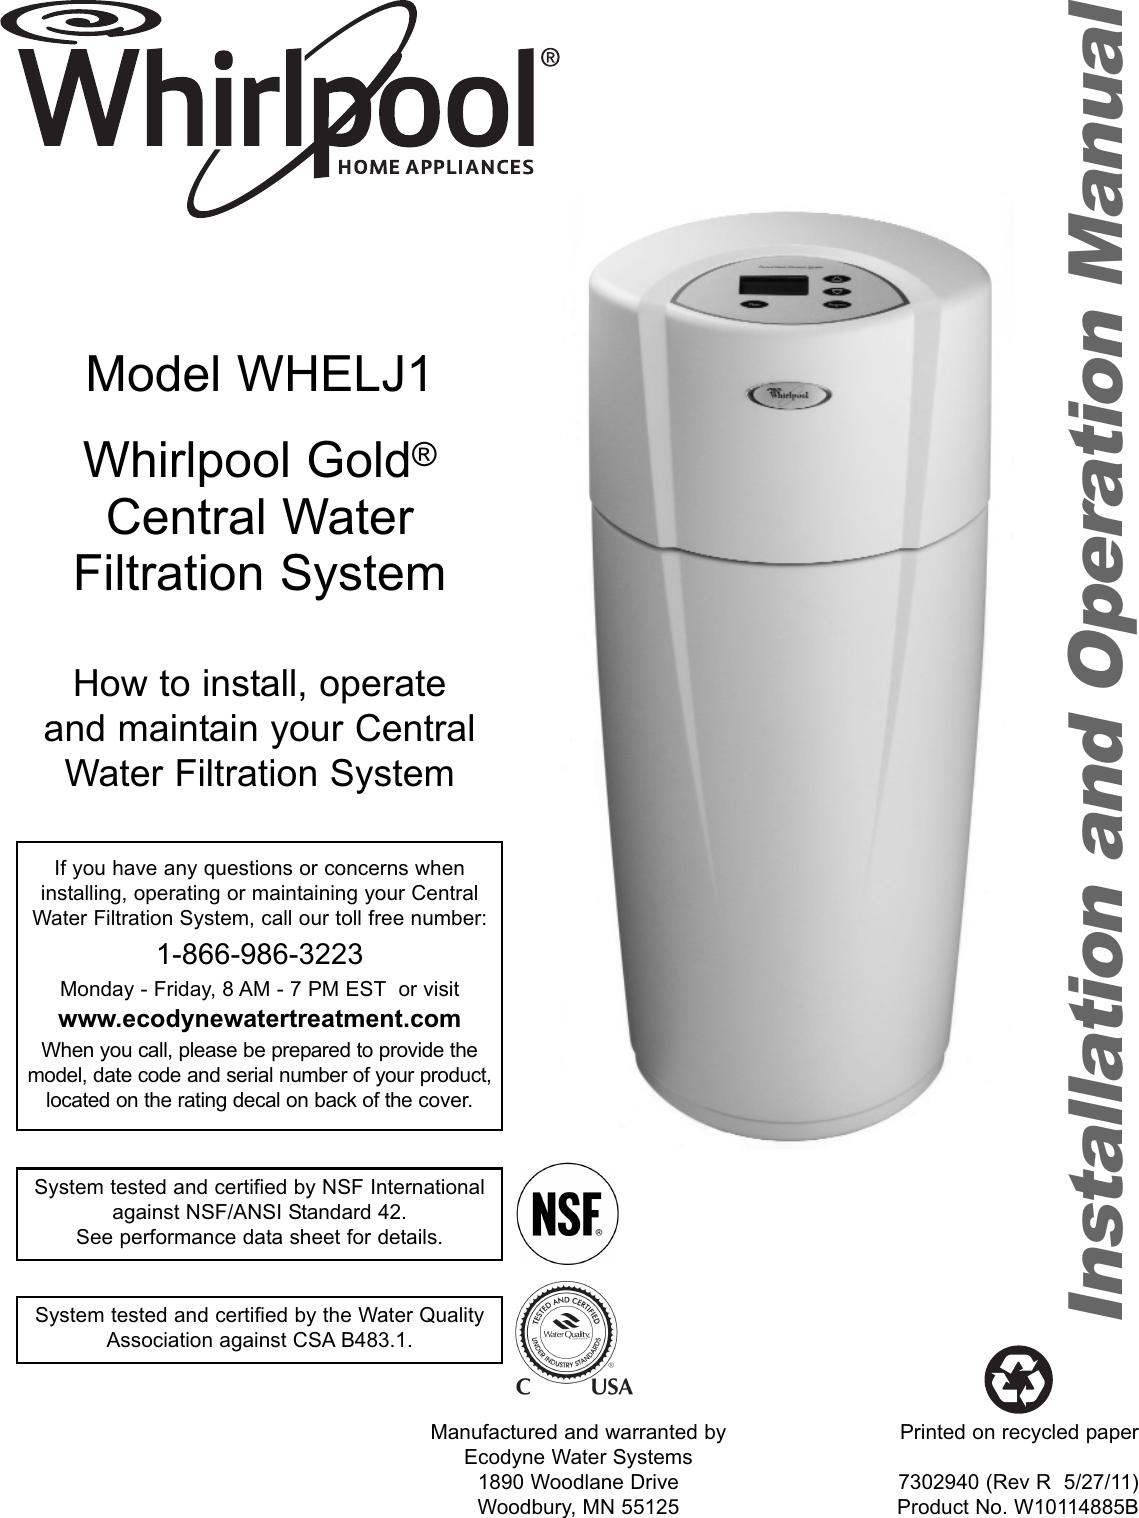 Whirlpool Whelj1 Owners Manual